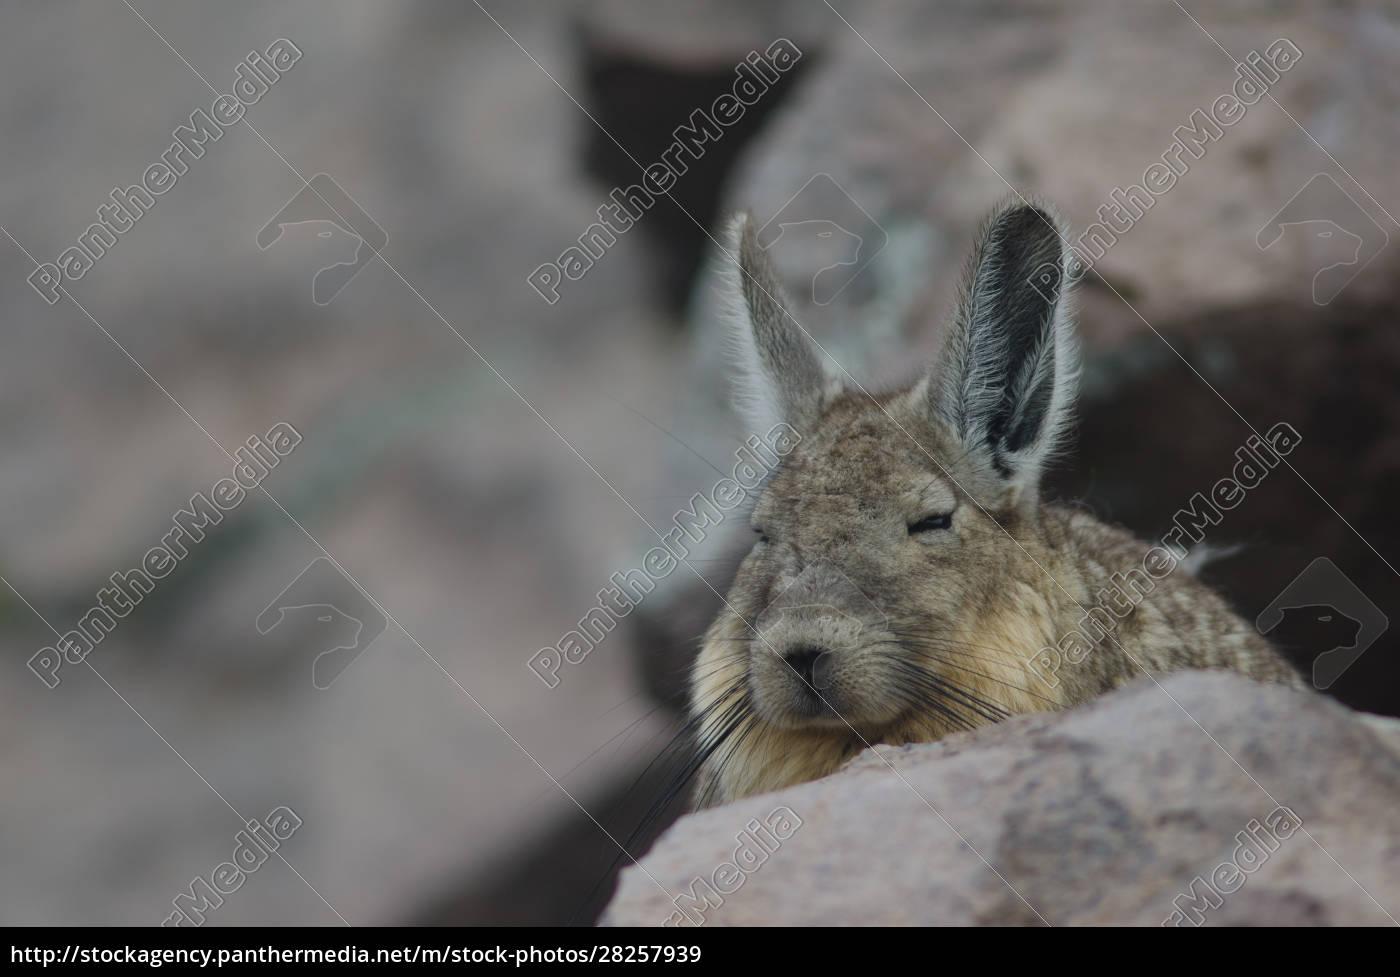 southern, viscacha, lagidium, viscacia, resting, in - 28257939